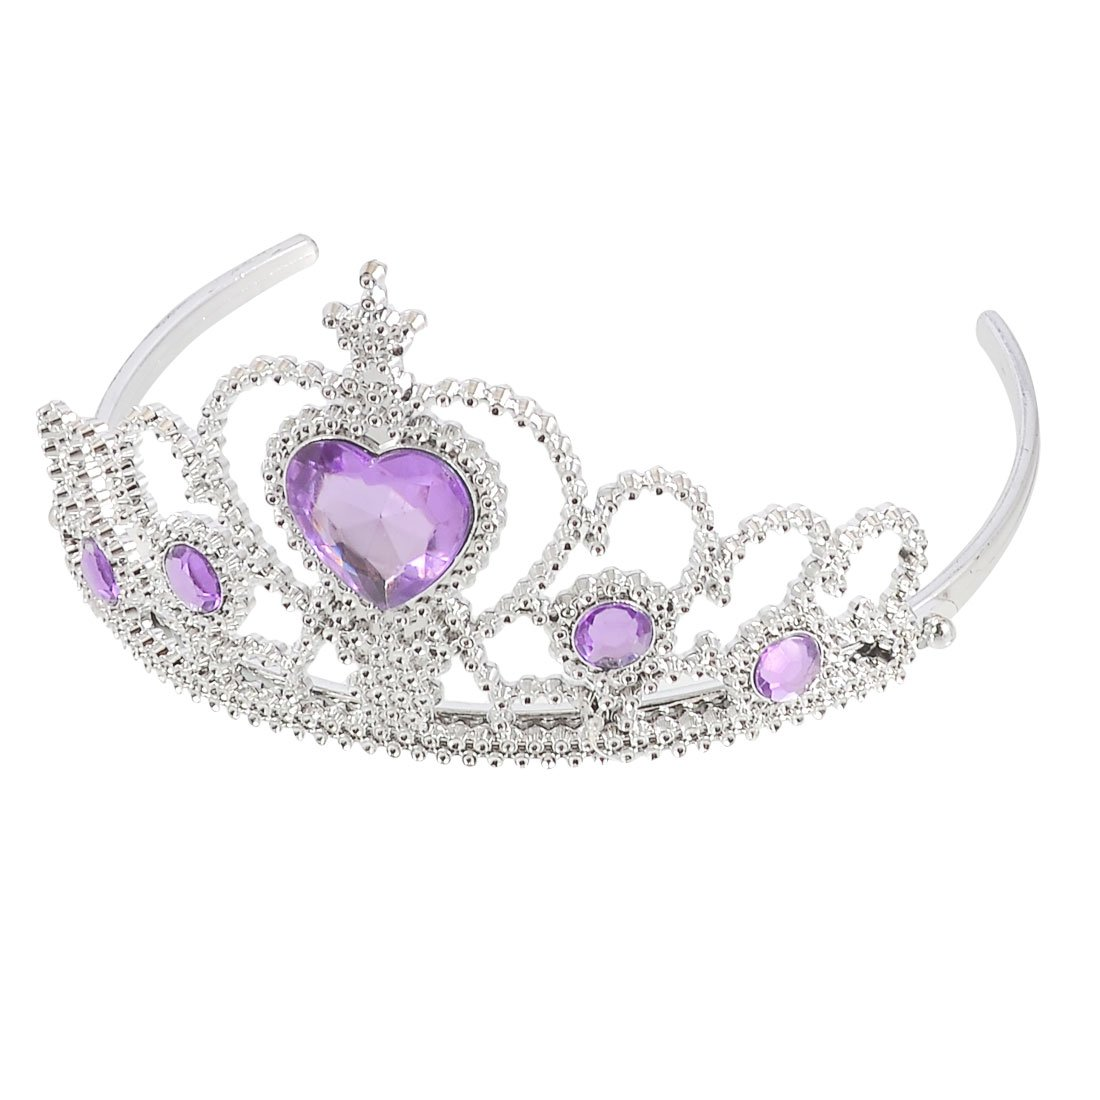 Plastic Woman Wedding Faux RhInestone Tiara Headband Silver Tone Purple PK L2V3